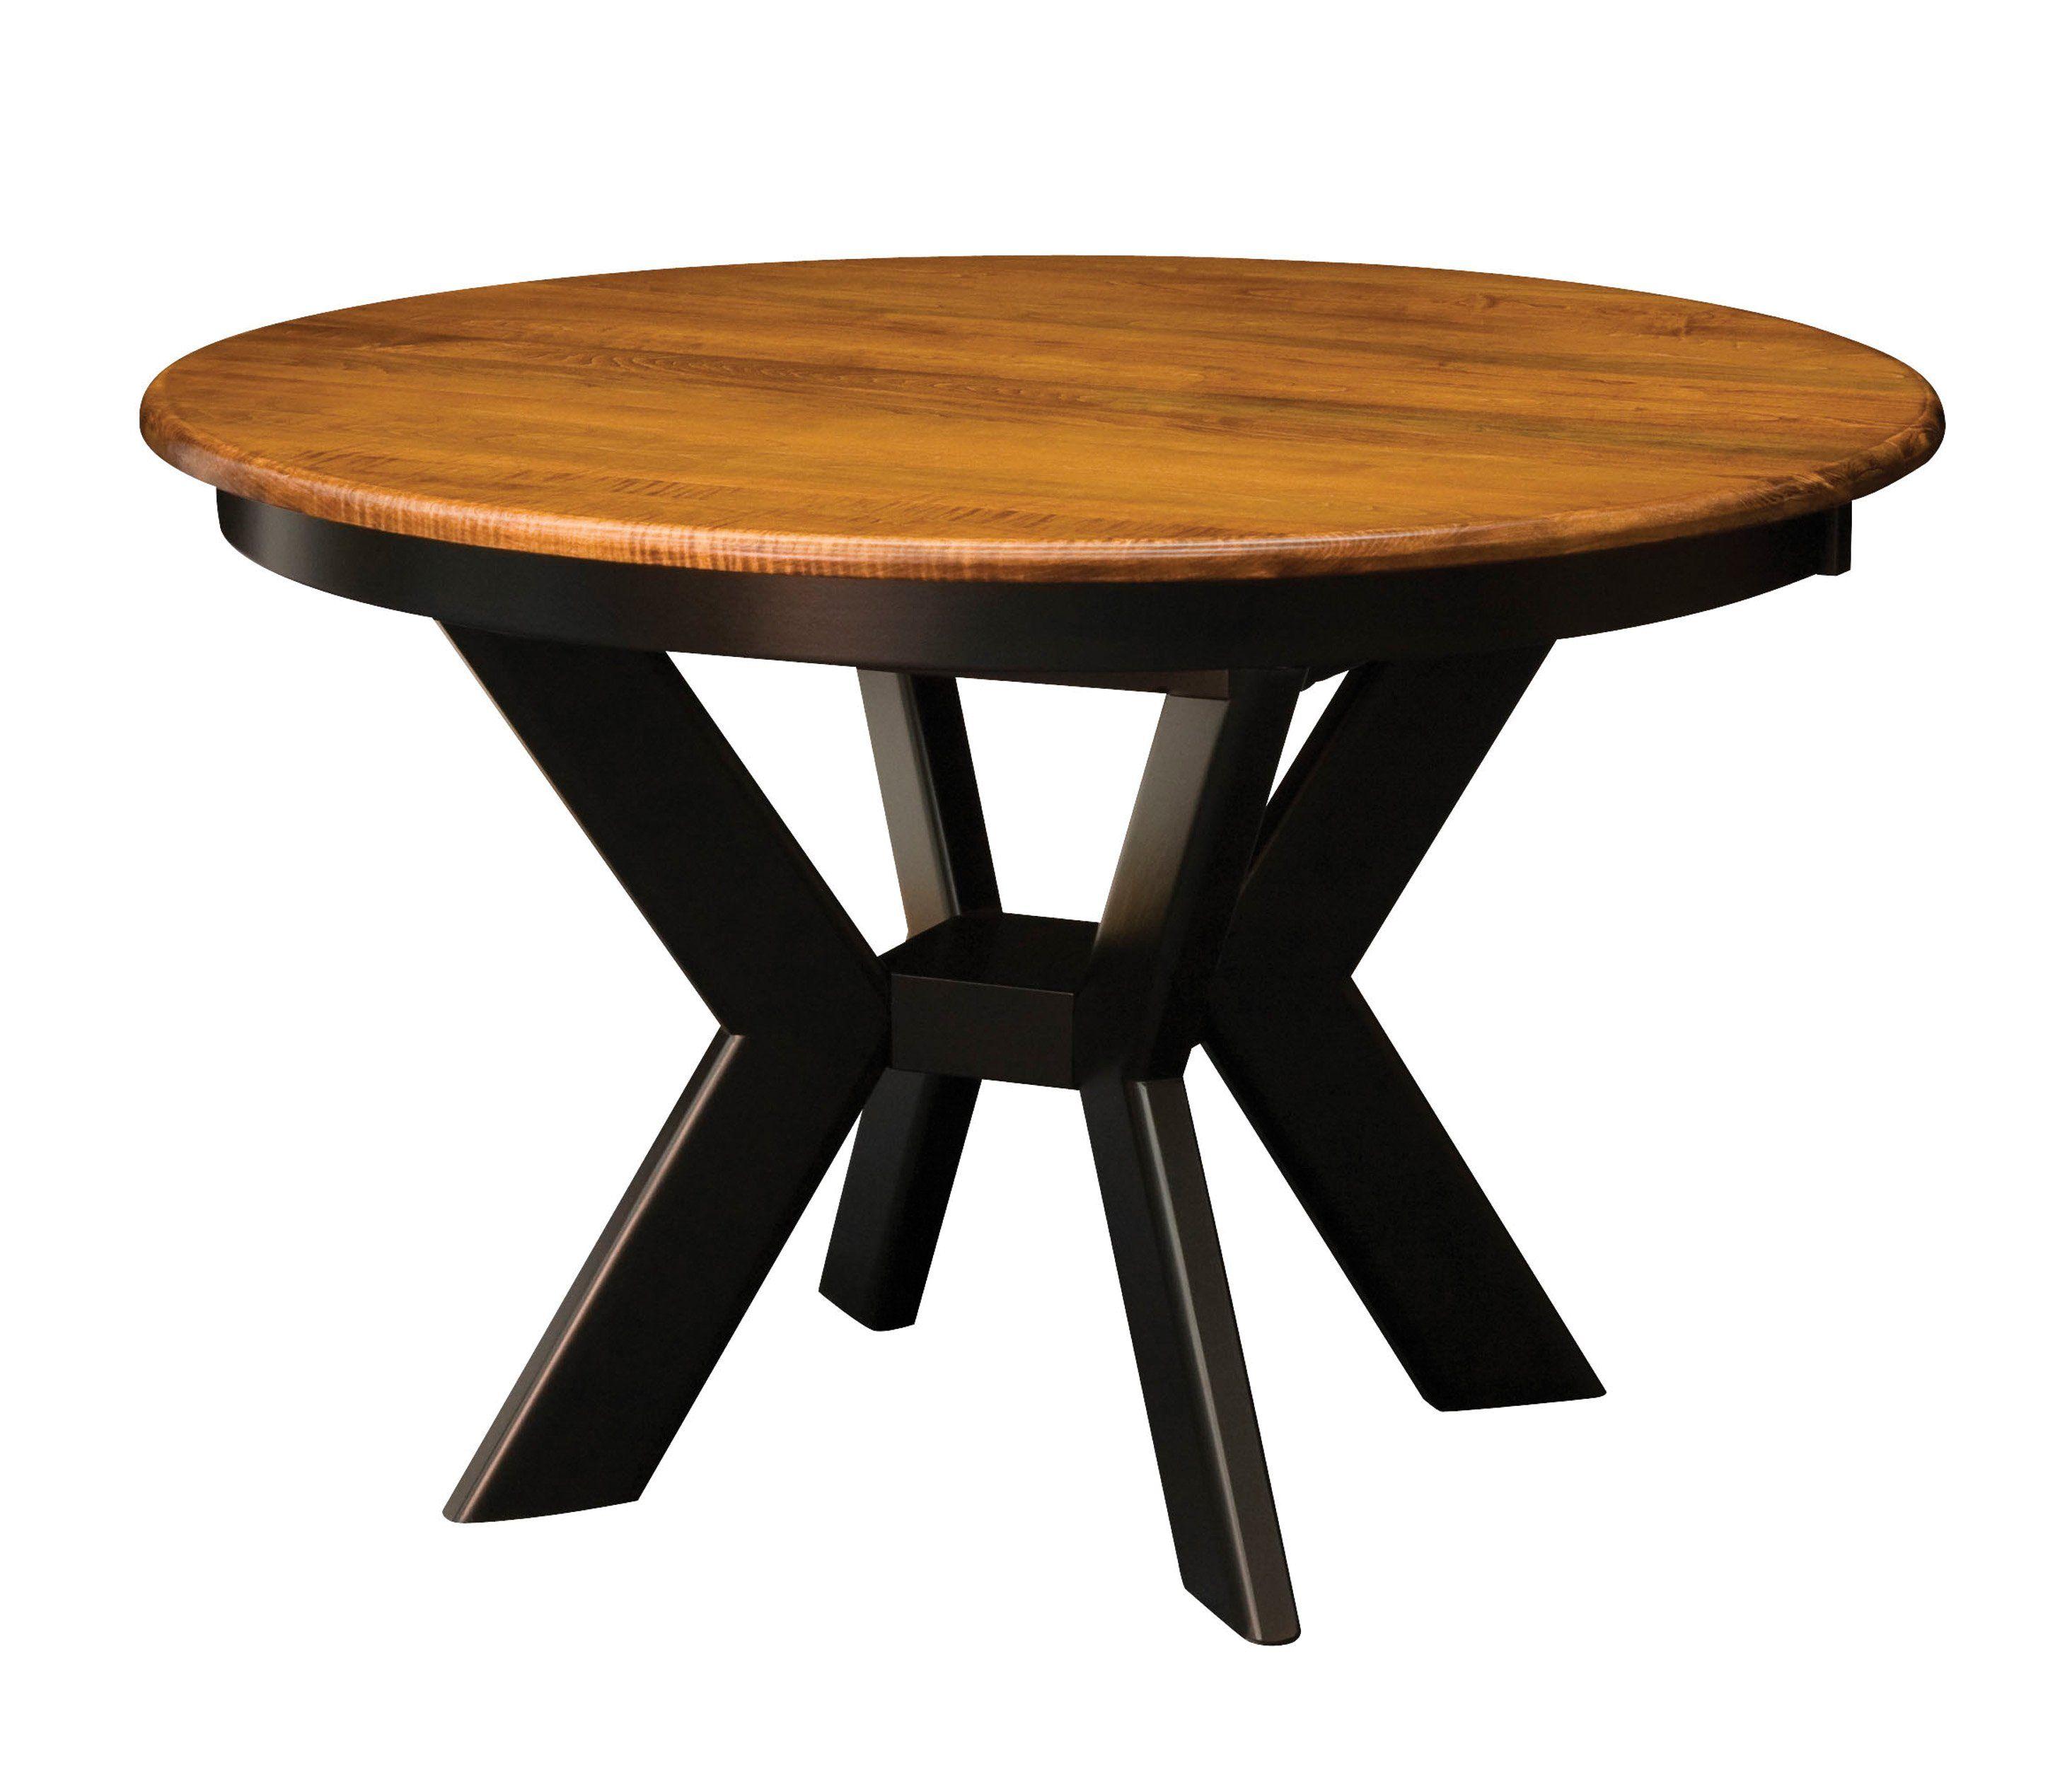 Kenwood Table Ok Amish Furniture 918 236 3808 With Images Amish Furniture Pedestal Dining Table Dining Table Black